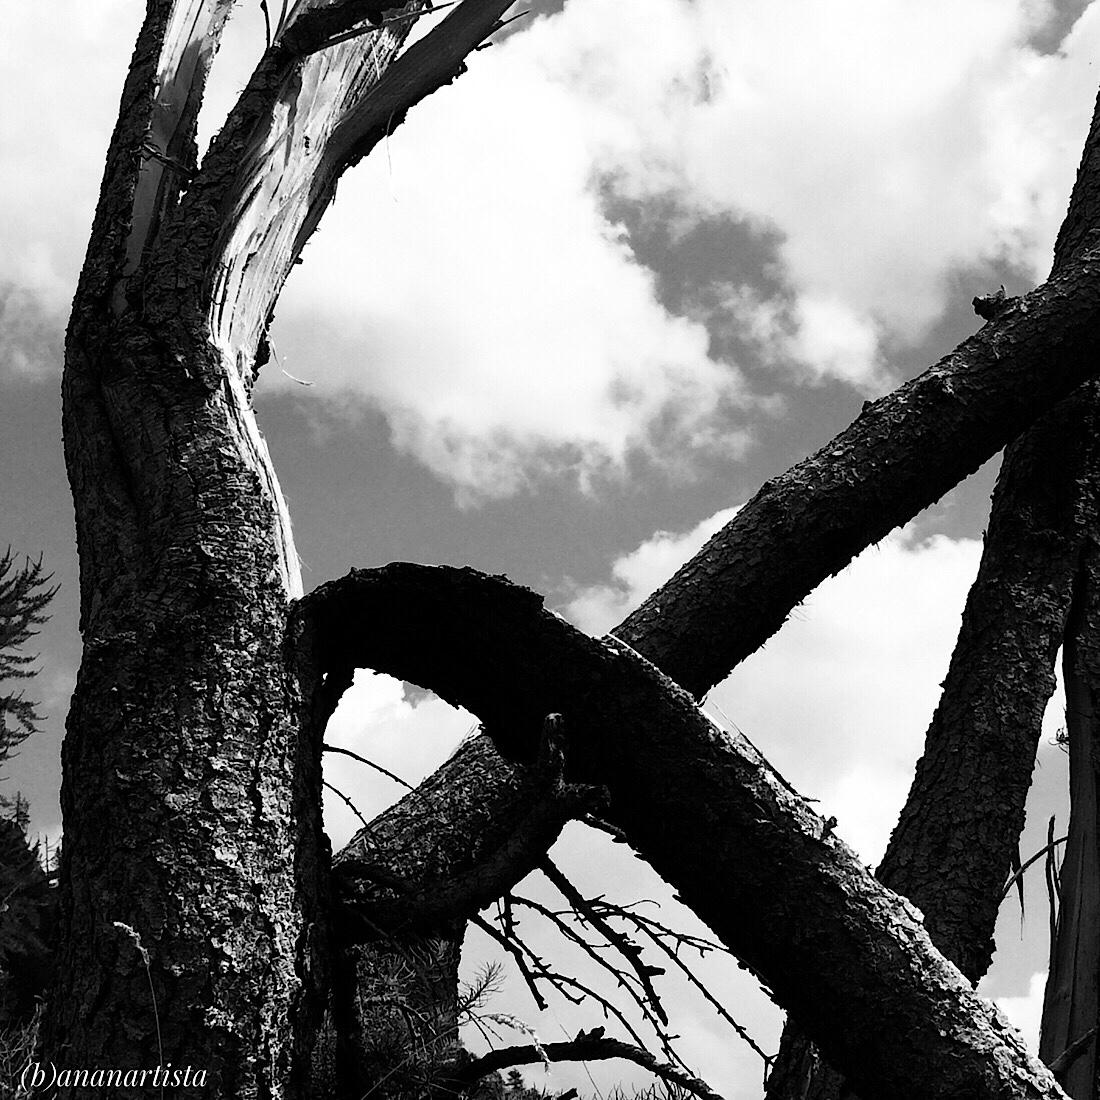 mammoth mastodon photography by (b)ananartista sbuff